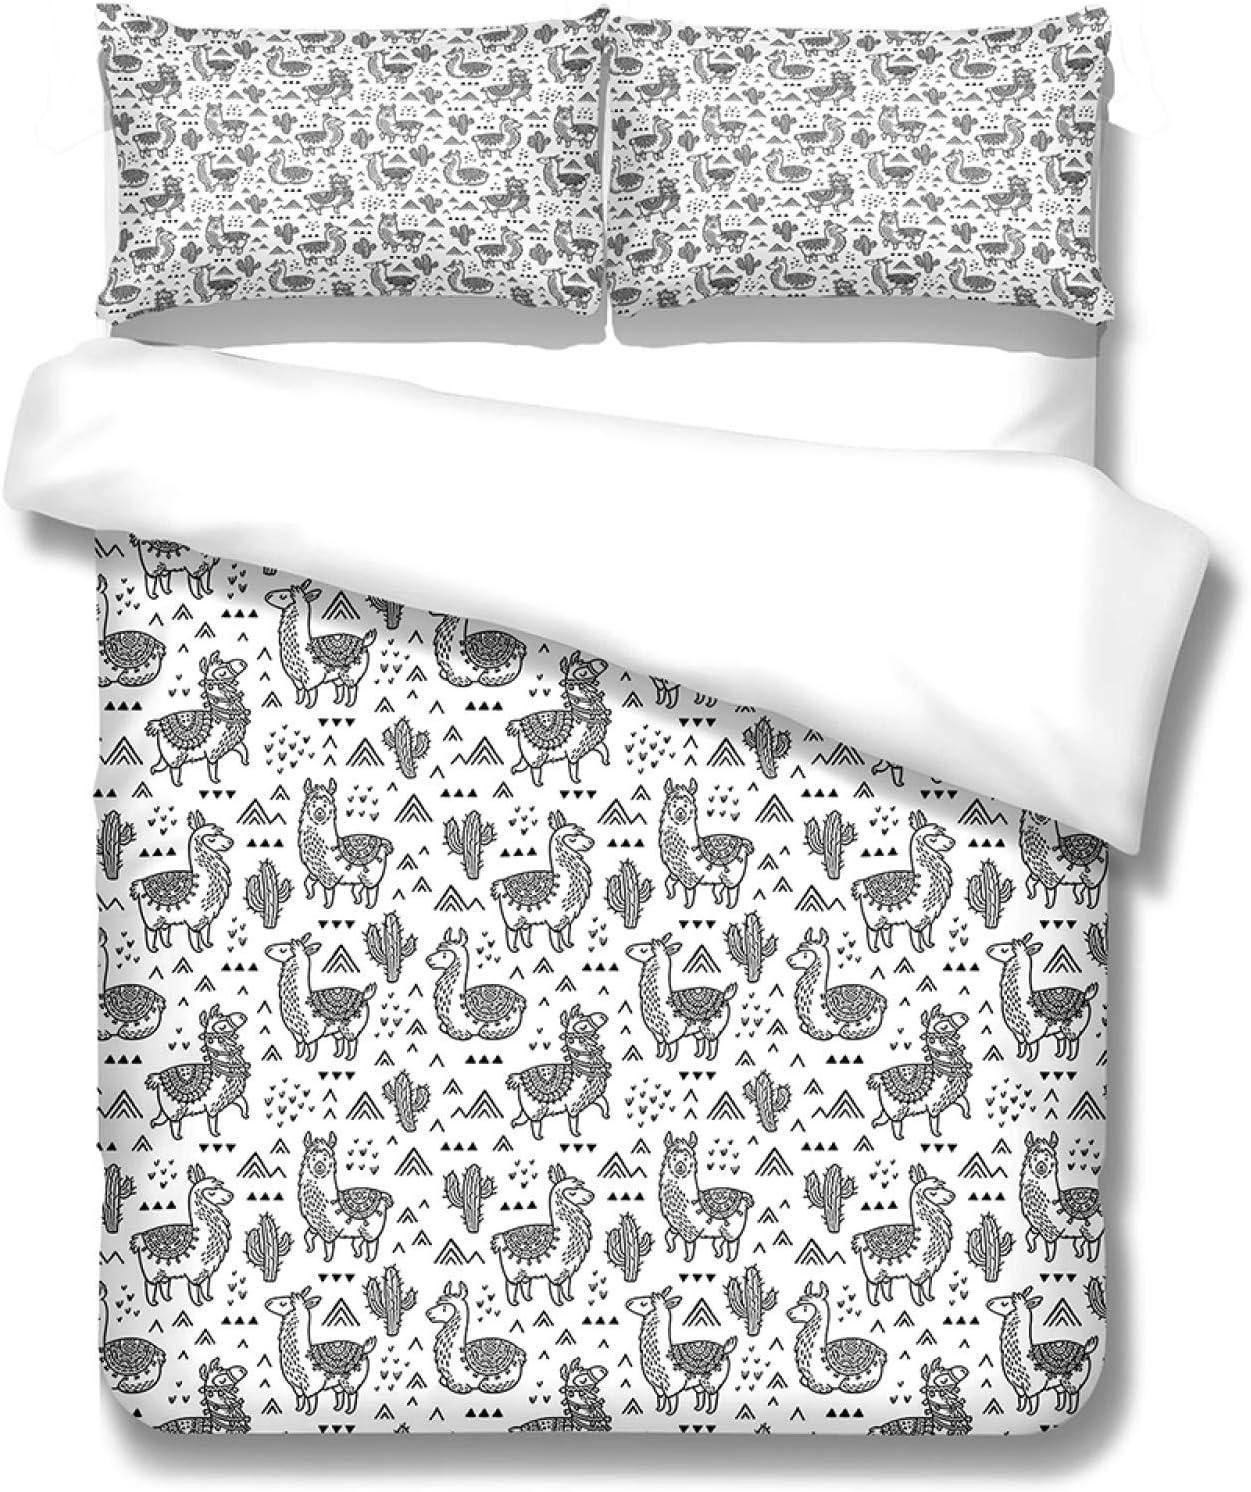 YUEKDA 3D Duvet Cover 3 Pieces Max 88% OFF Sheep Printed Max 86% OFF Bedd Animal Cartoon